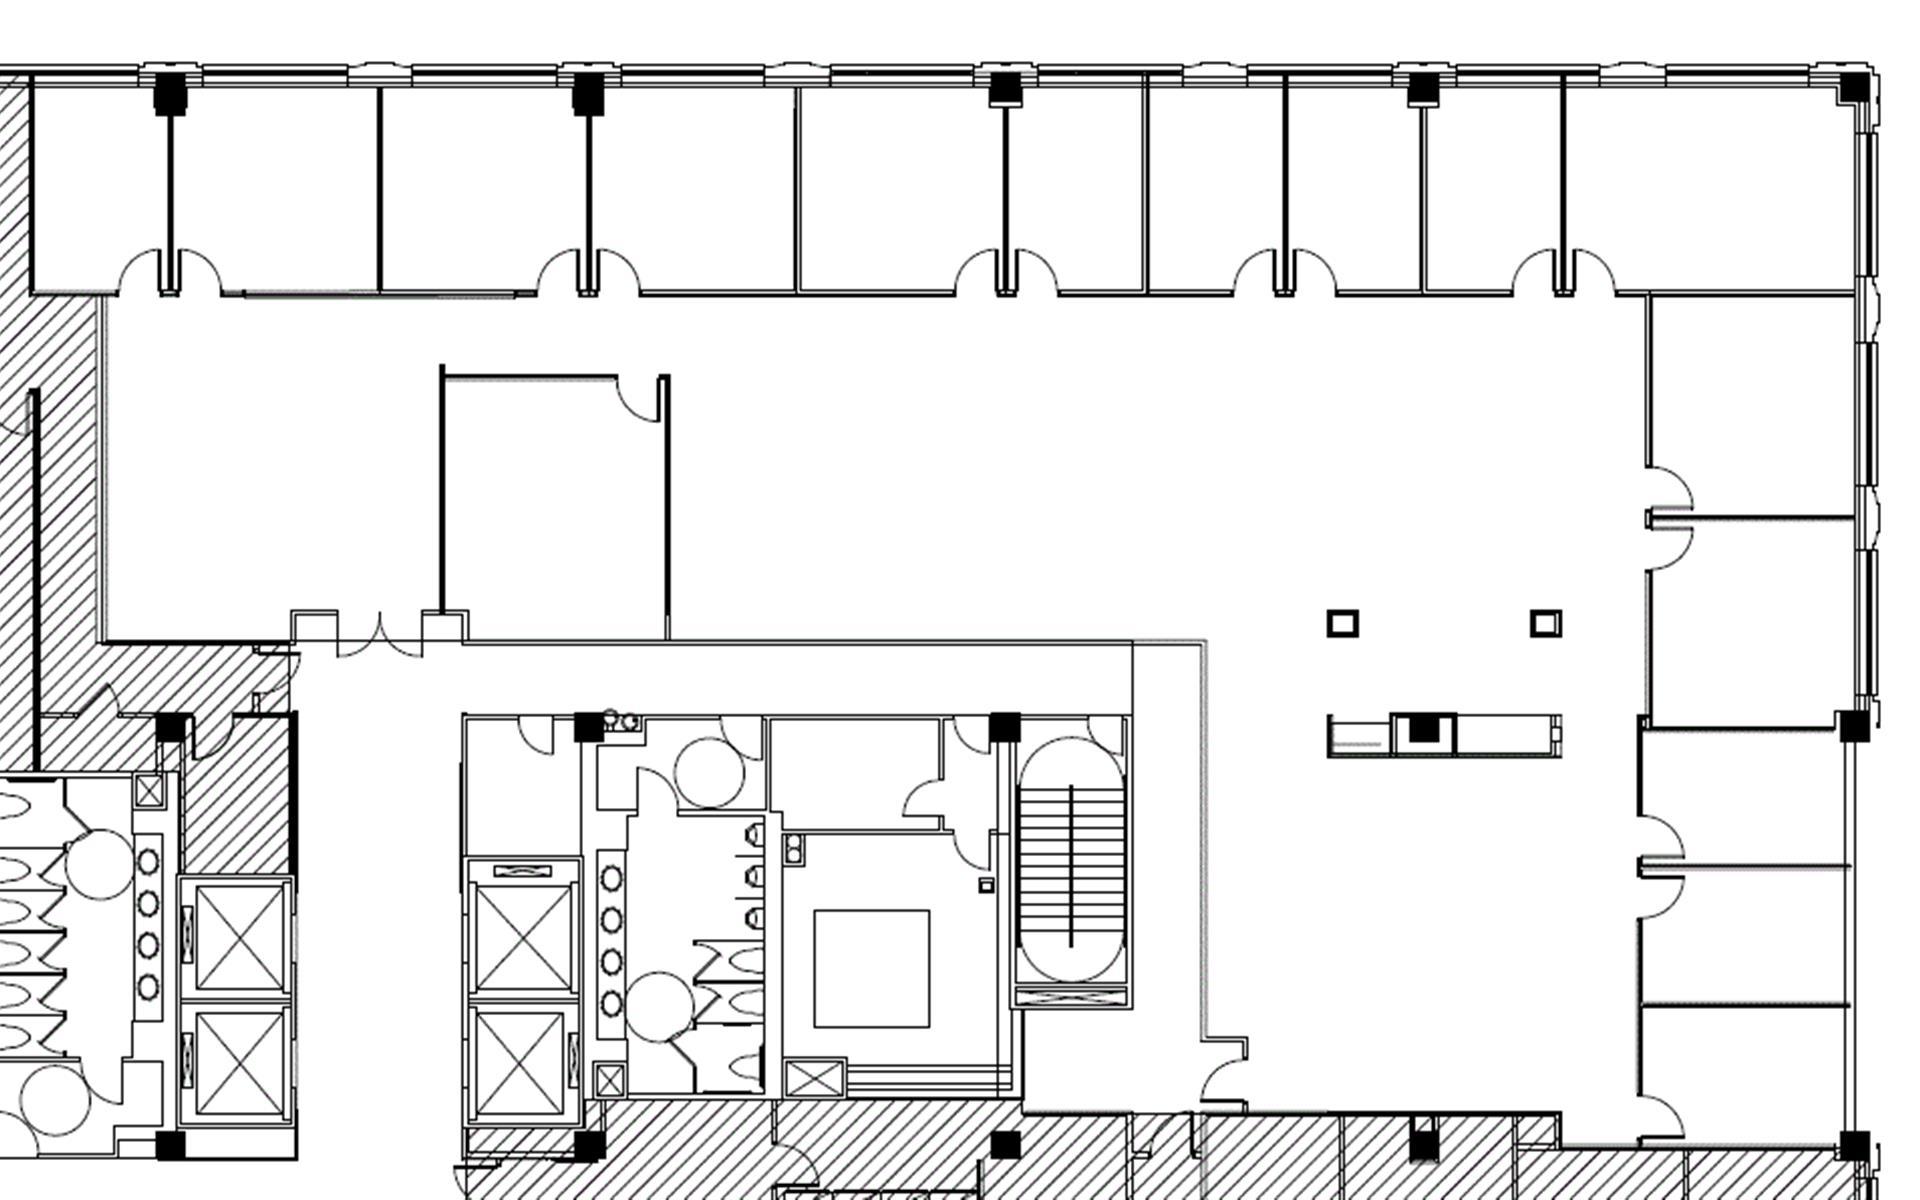 WashingtonREIT | Monument II - Team Office | Suite 550